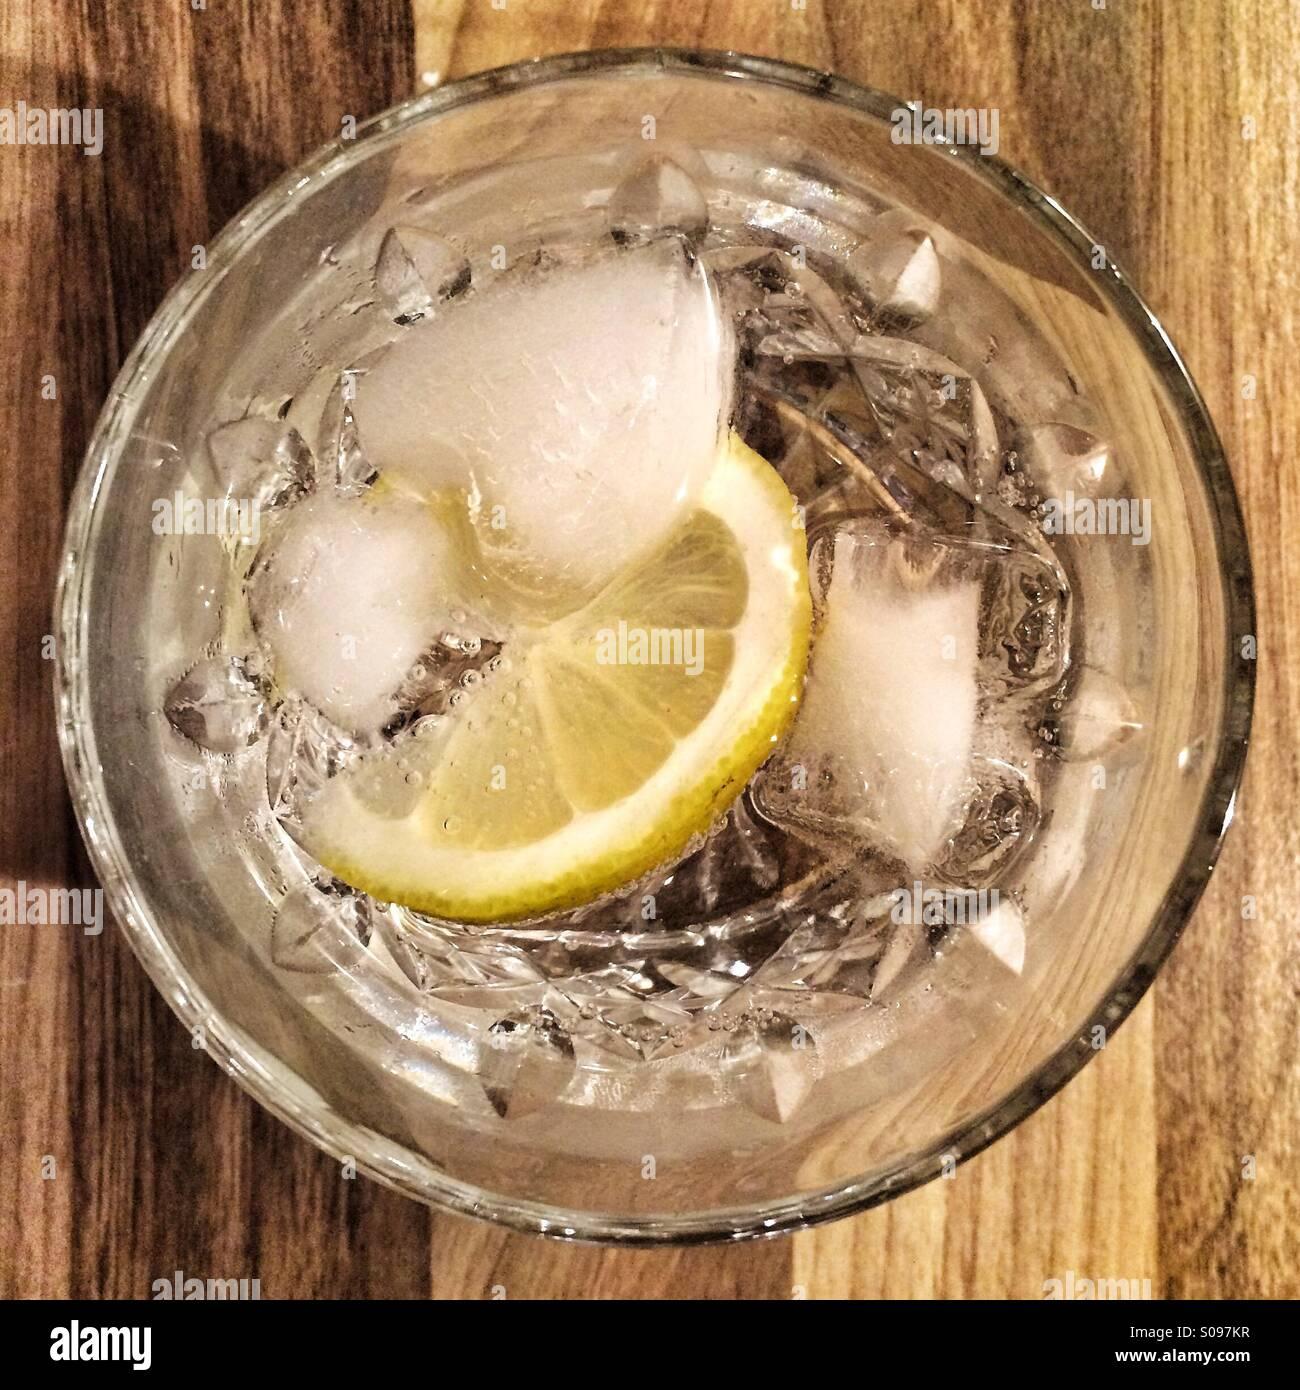 Gin & tonic - Stock Image